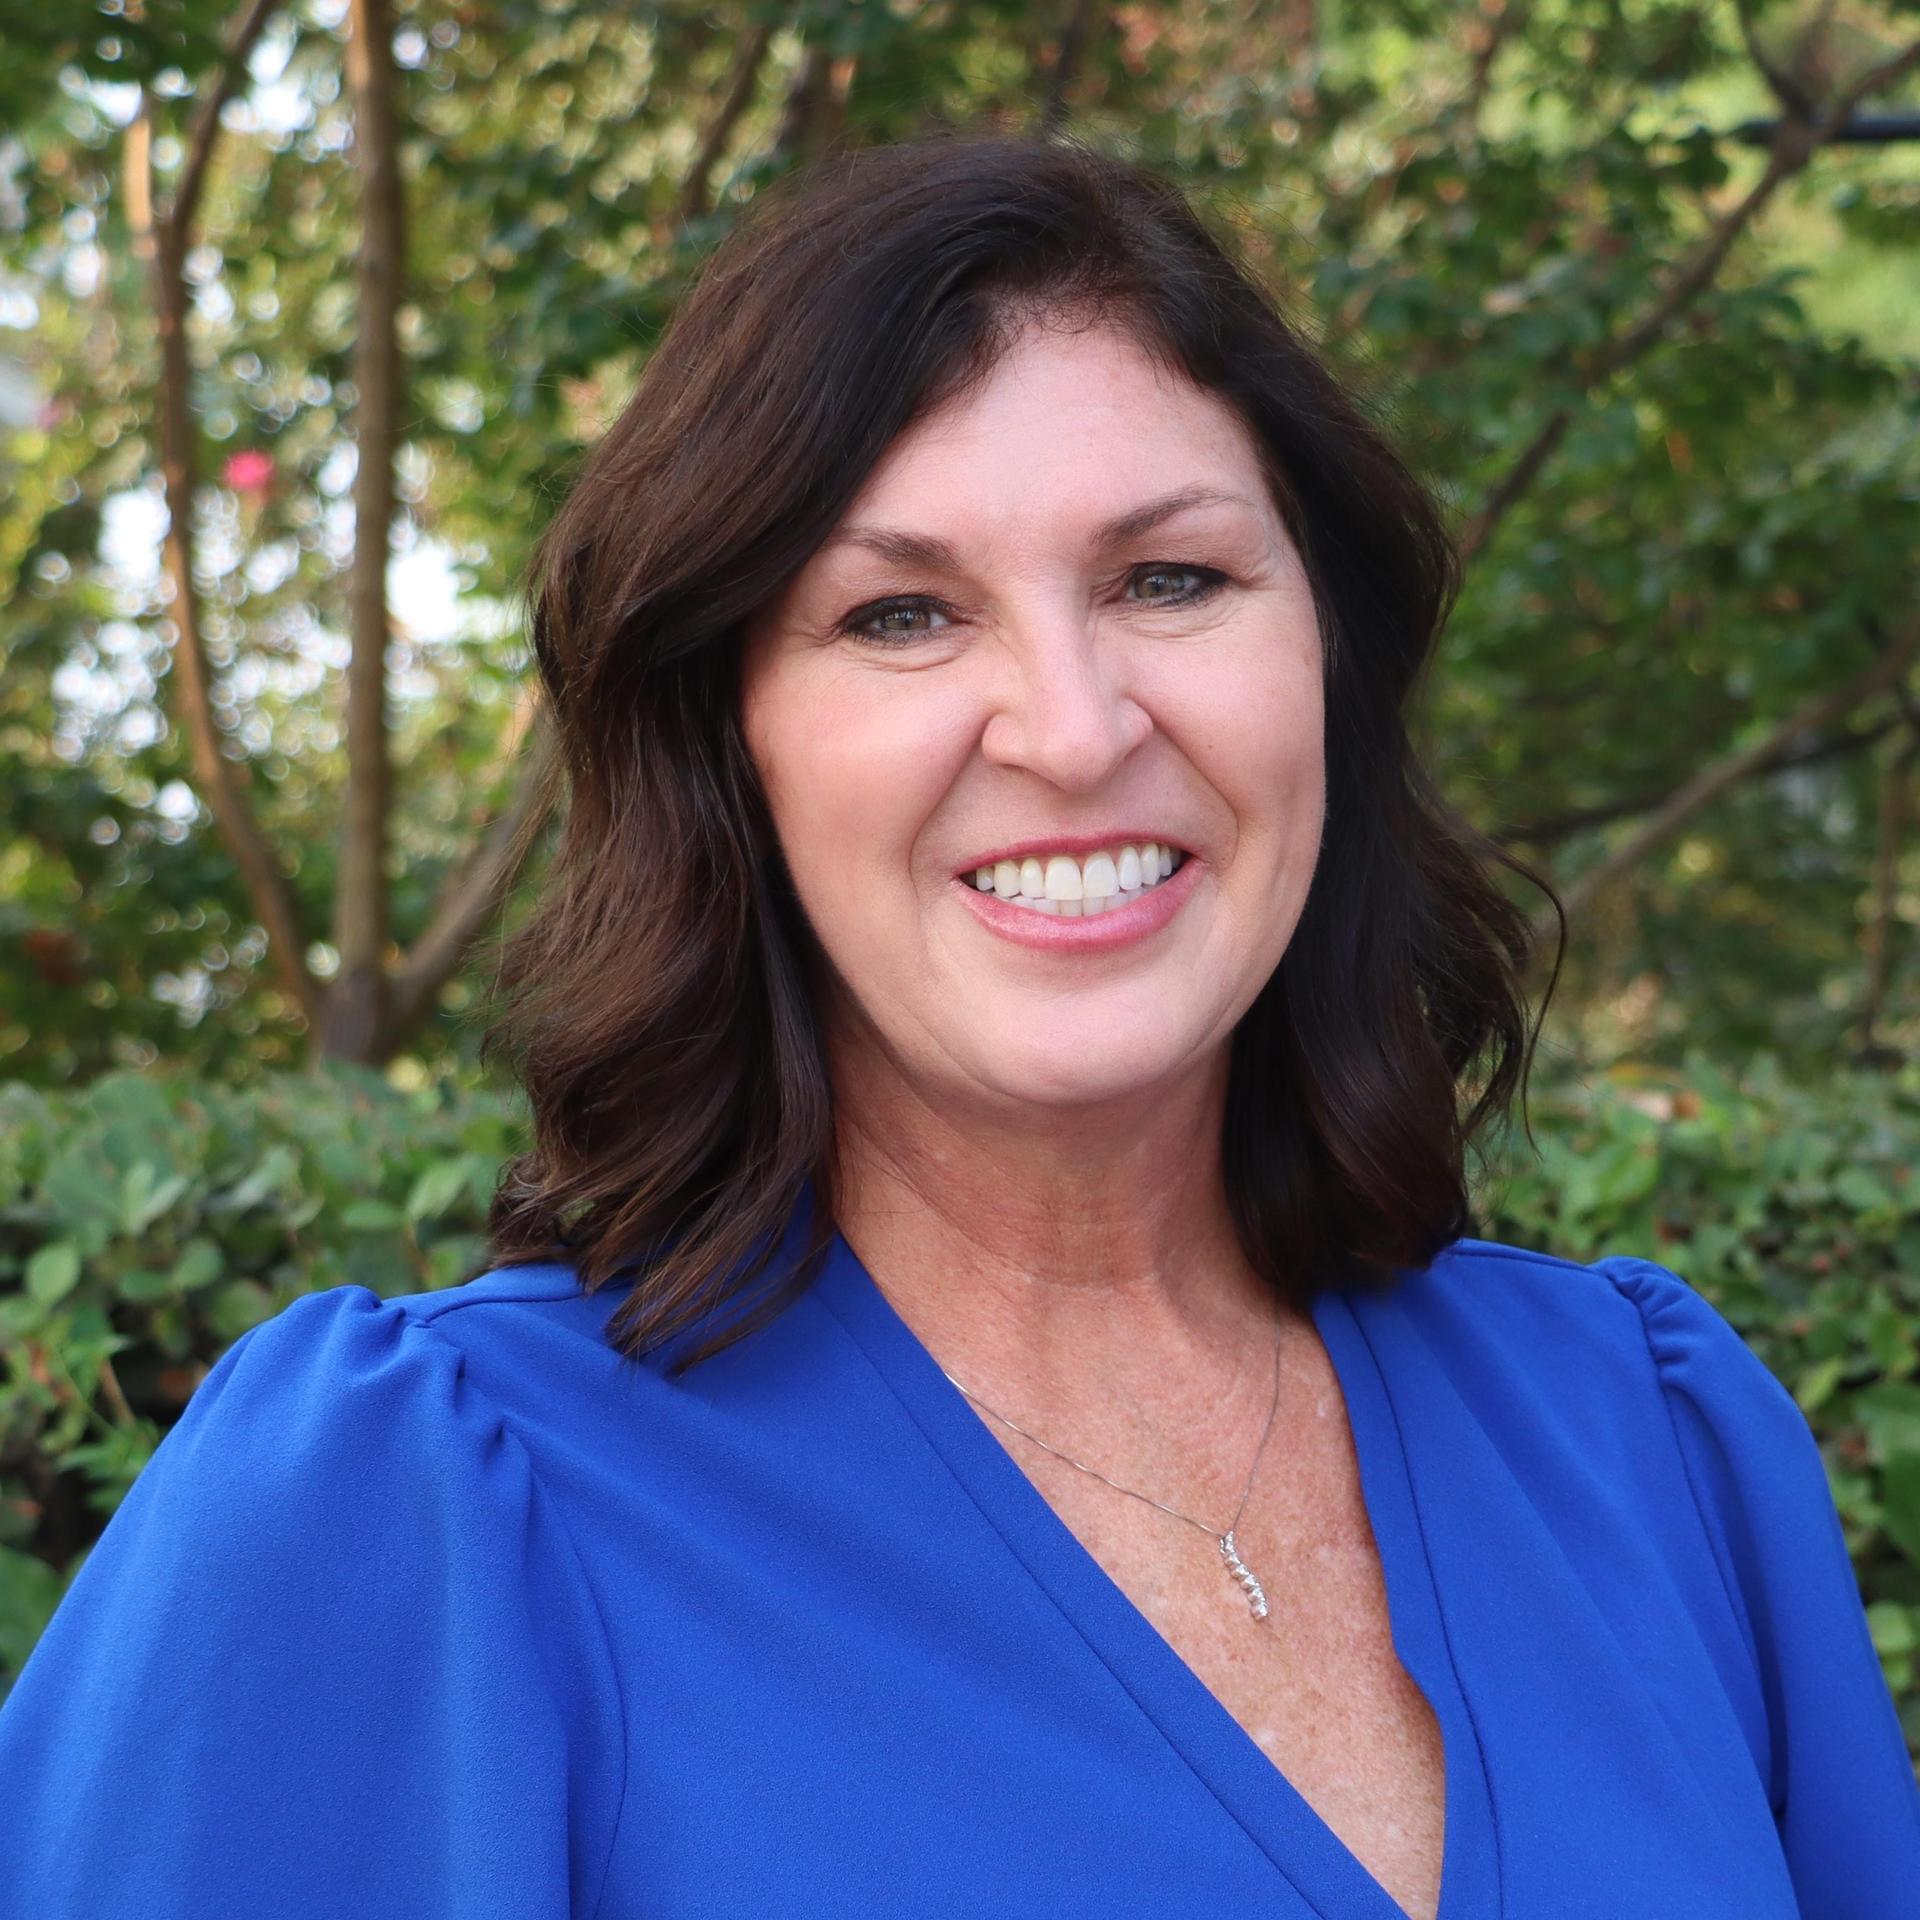 Debby Shannon - Coordinator